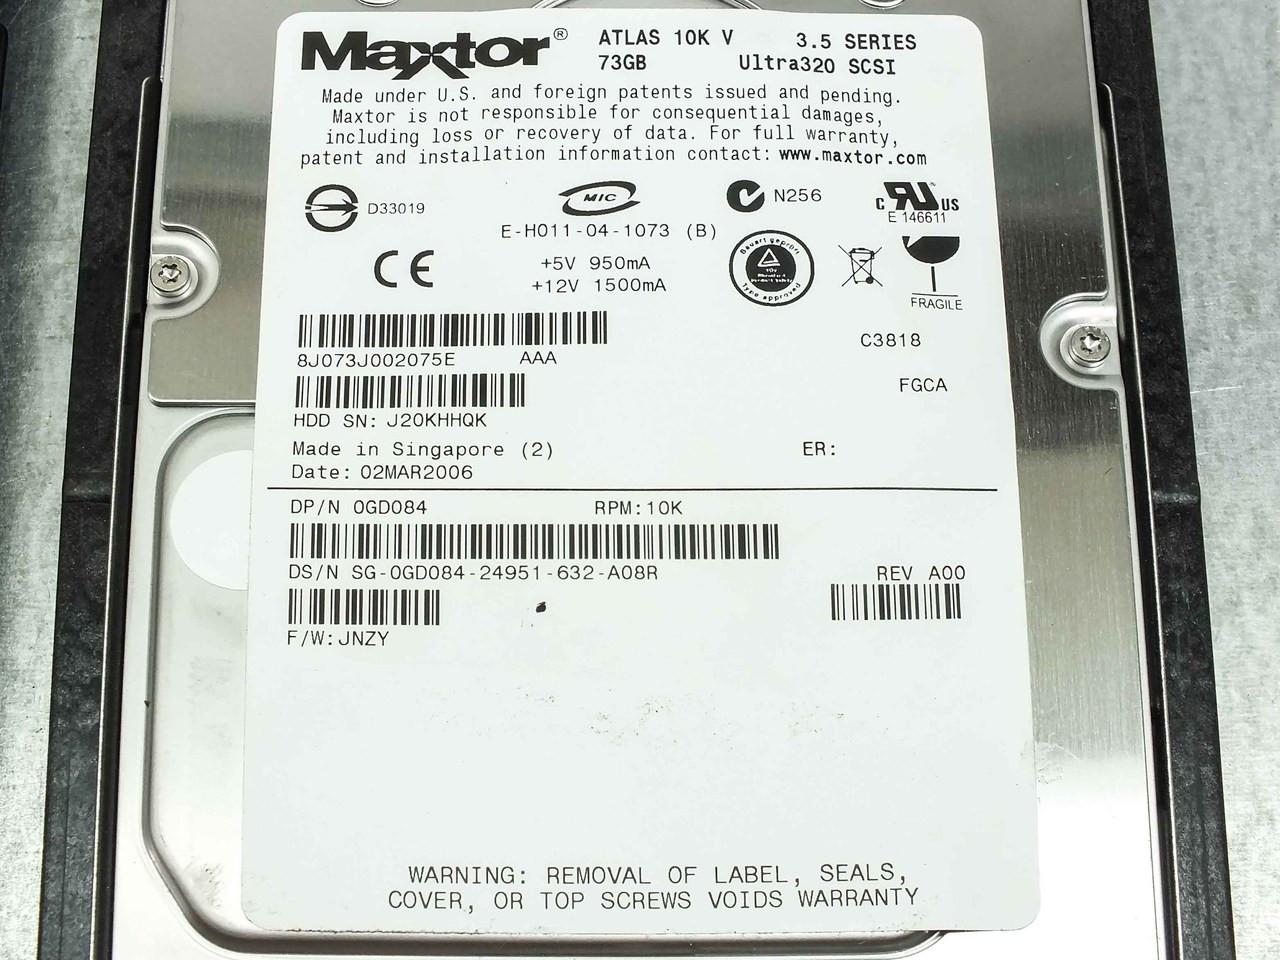 Dell PowerEdge 2850 Xeon 3 0GHz Server, 4GB RAM, (4) 73GB and (2) 36GB HDD